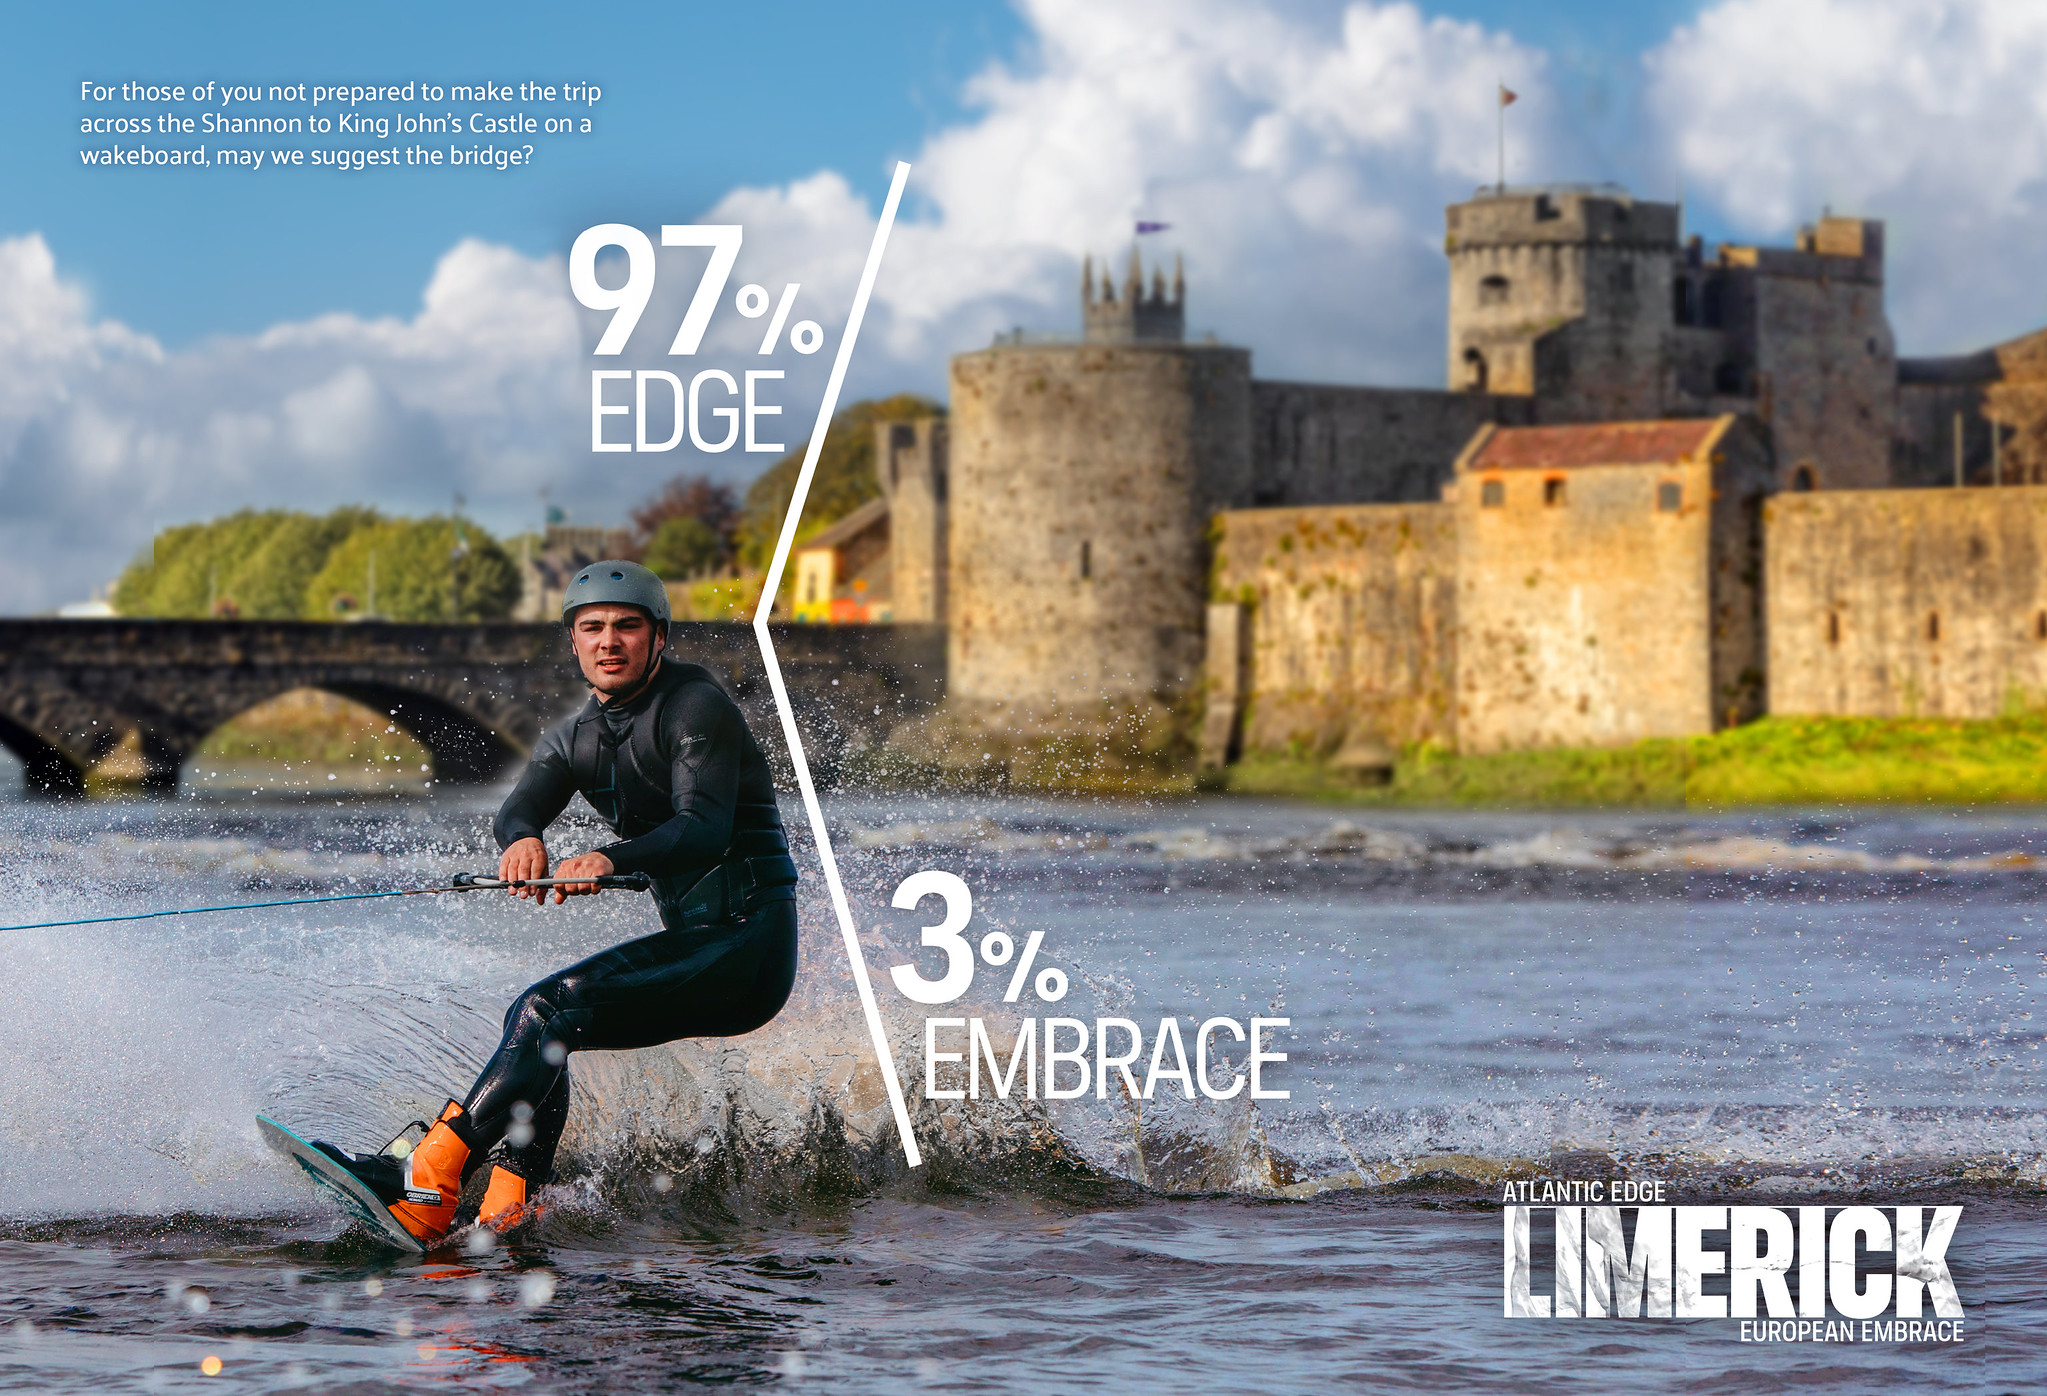 Limerick - Atlantic Edge, European Embrace